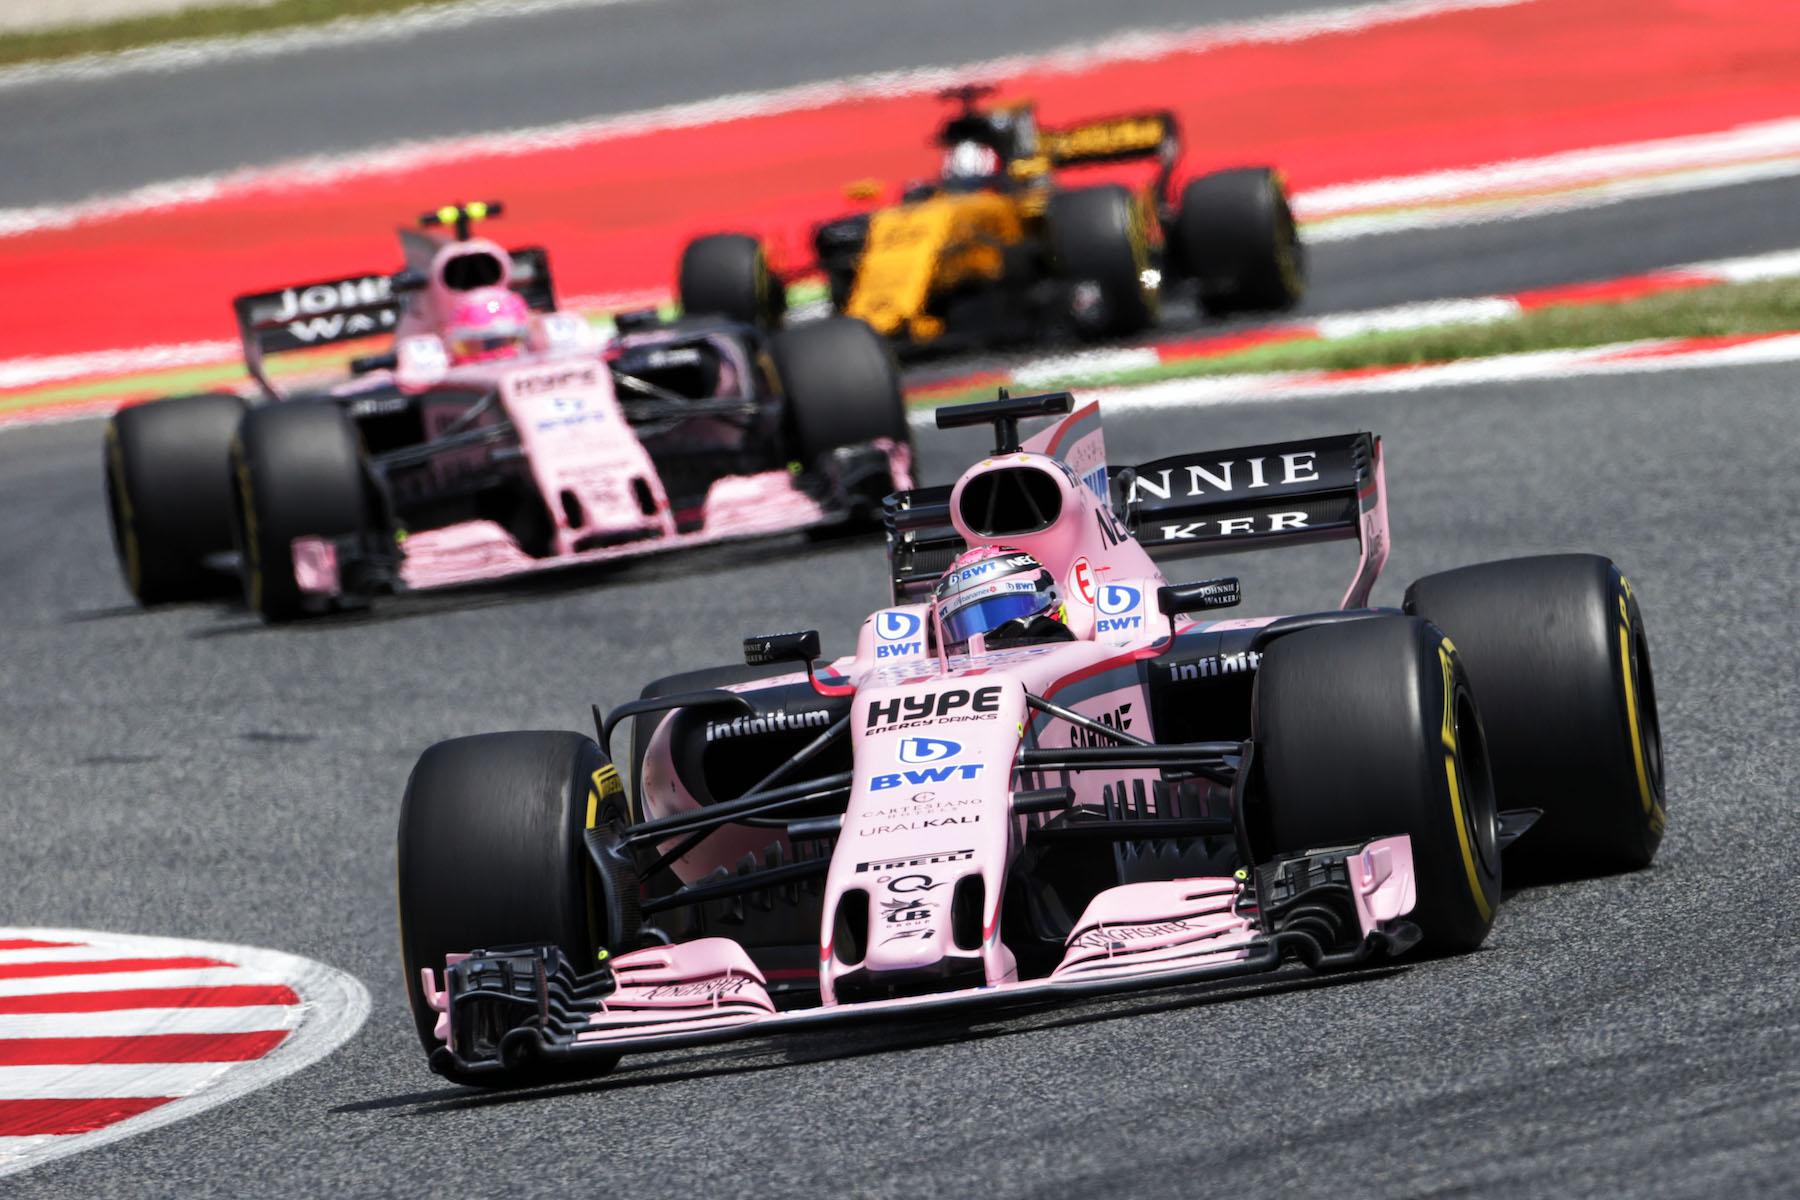 E 2017 Sergio Perez | Force India VJM10 | 2017 Spanish GP P4 2 copy.jpg